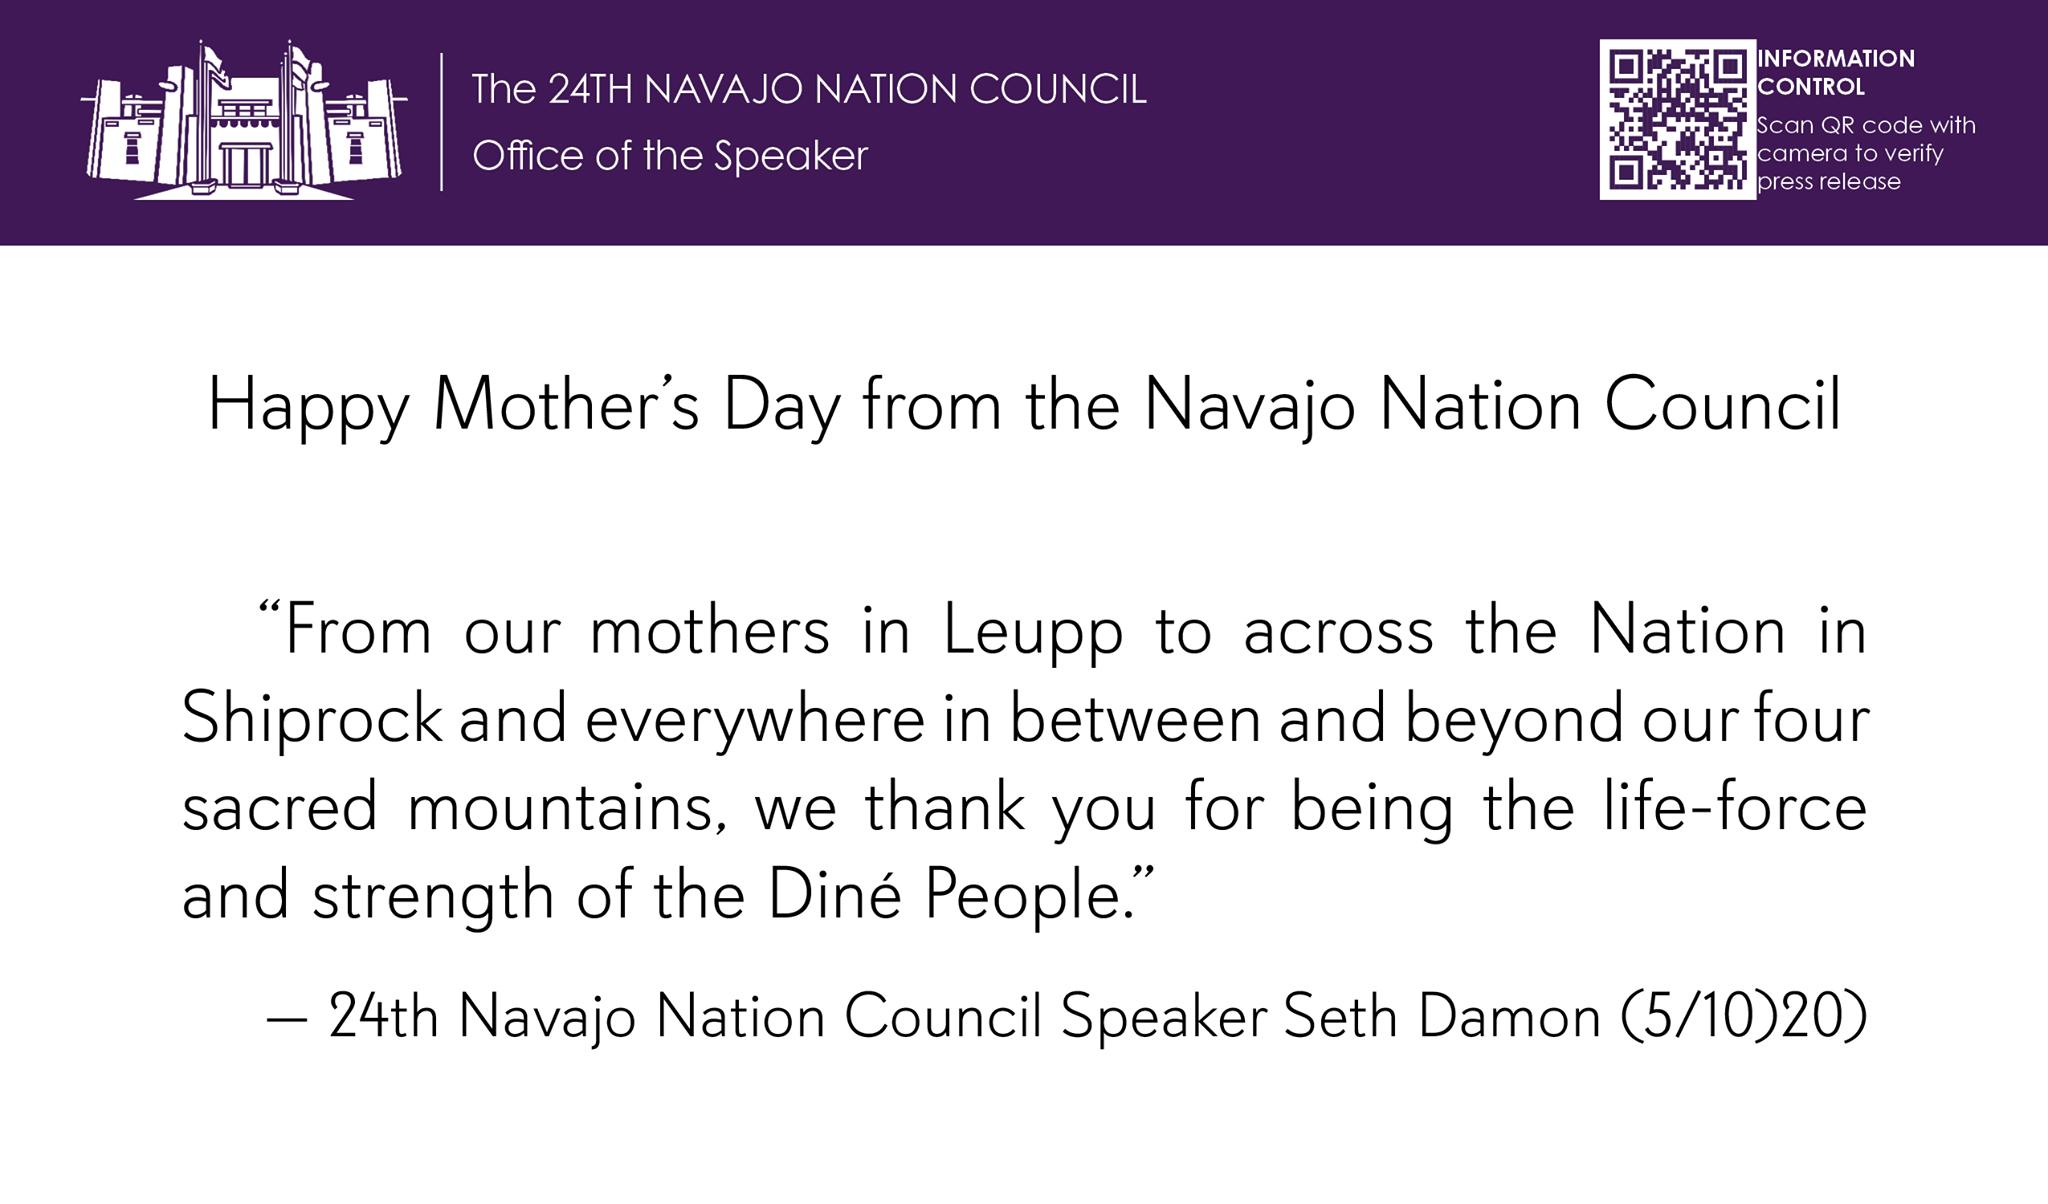 Navajo Nation Council (Arizona, New Mexico, Utah) in 2020